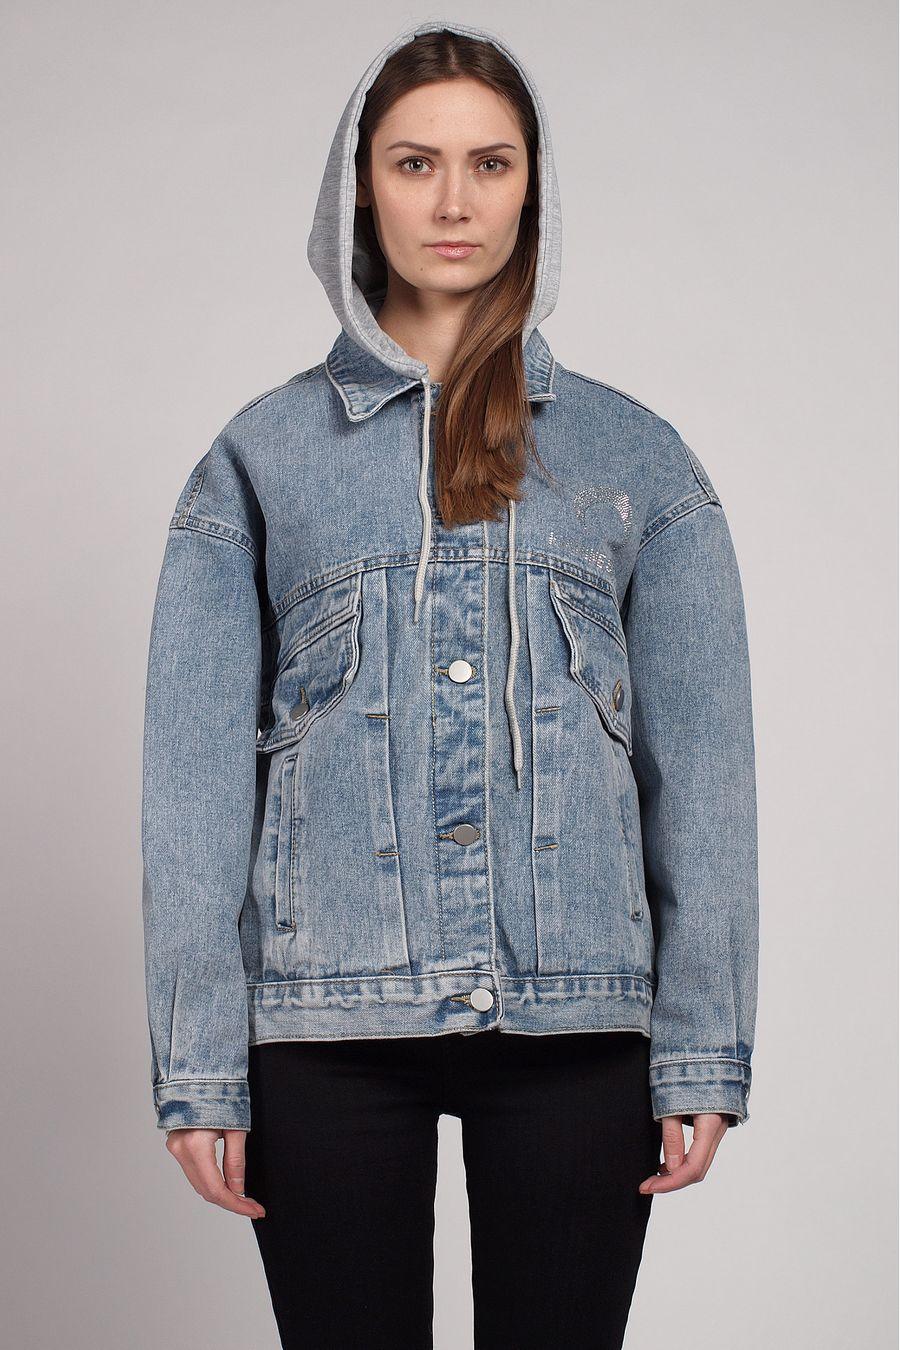 Жакет женский (джинсовка) LRZBS 2058 - фото 2